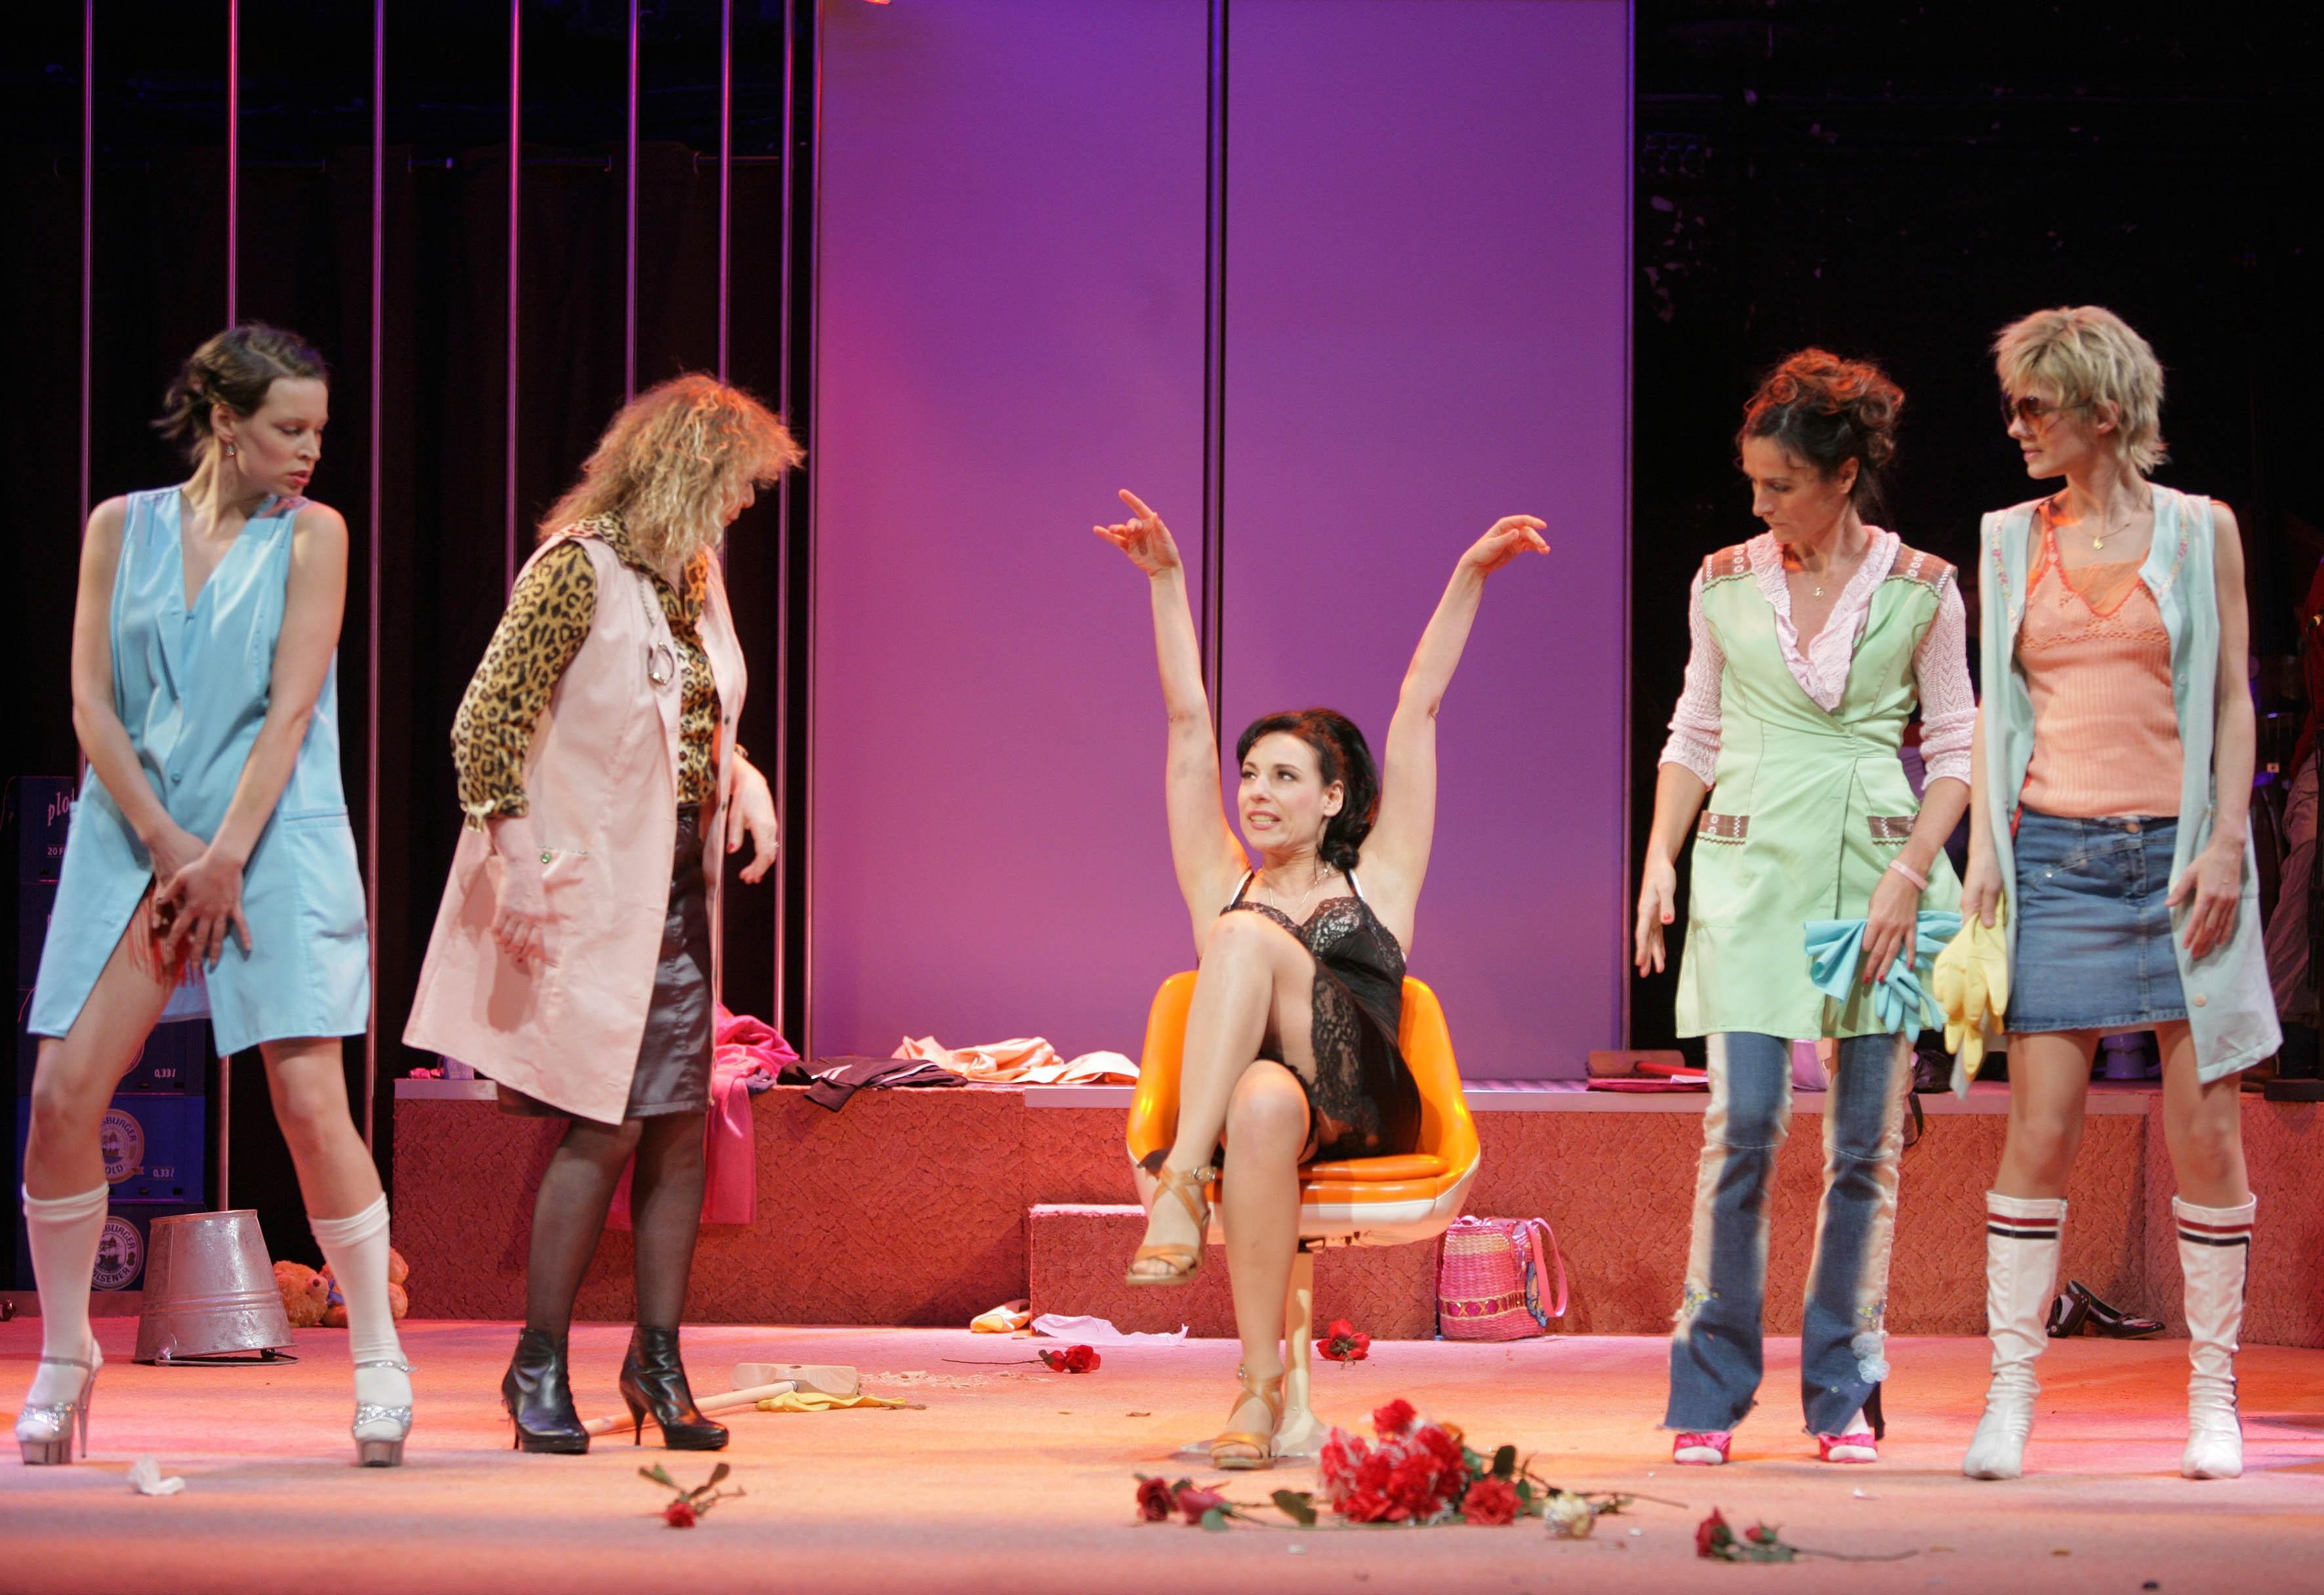 Lust - v.l.n.r.: Cordula Gerburg, Anneke Schwabe, Susanne Jansen, Sabrina Ascacibar, Anne Weber © St. Pauli Theater